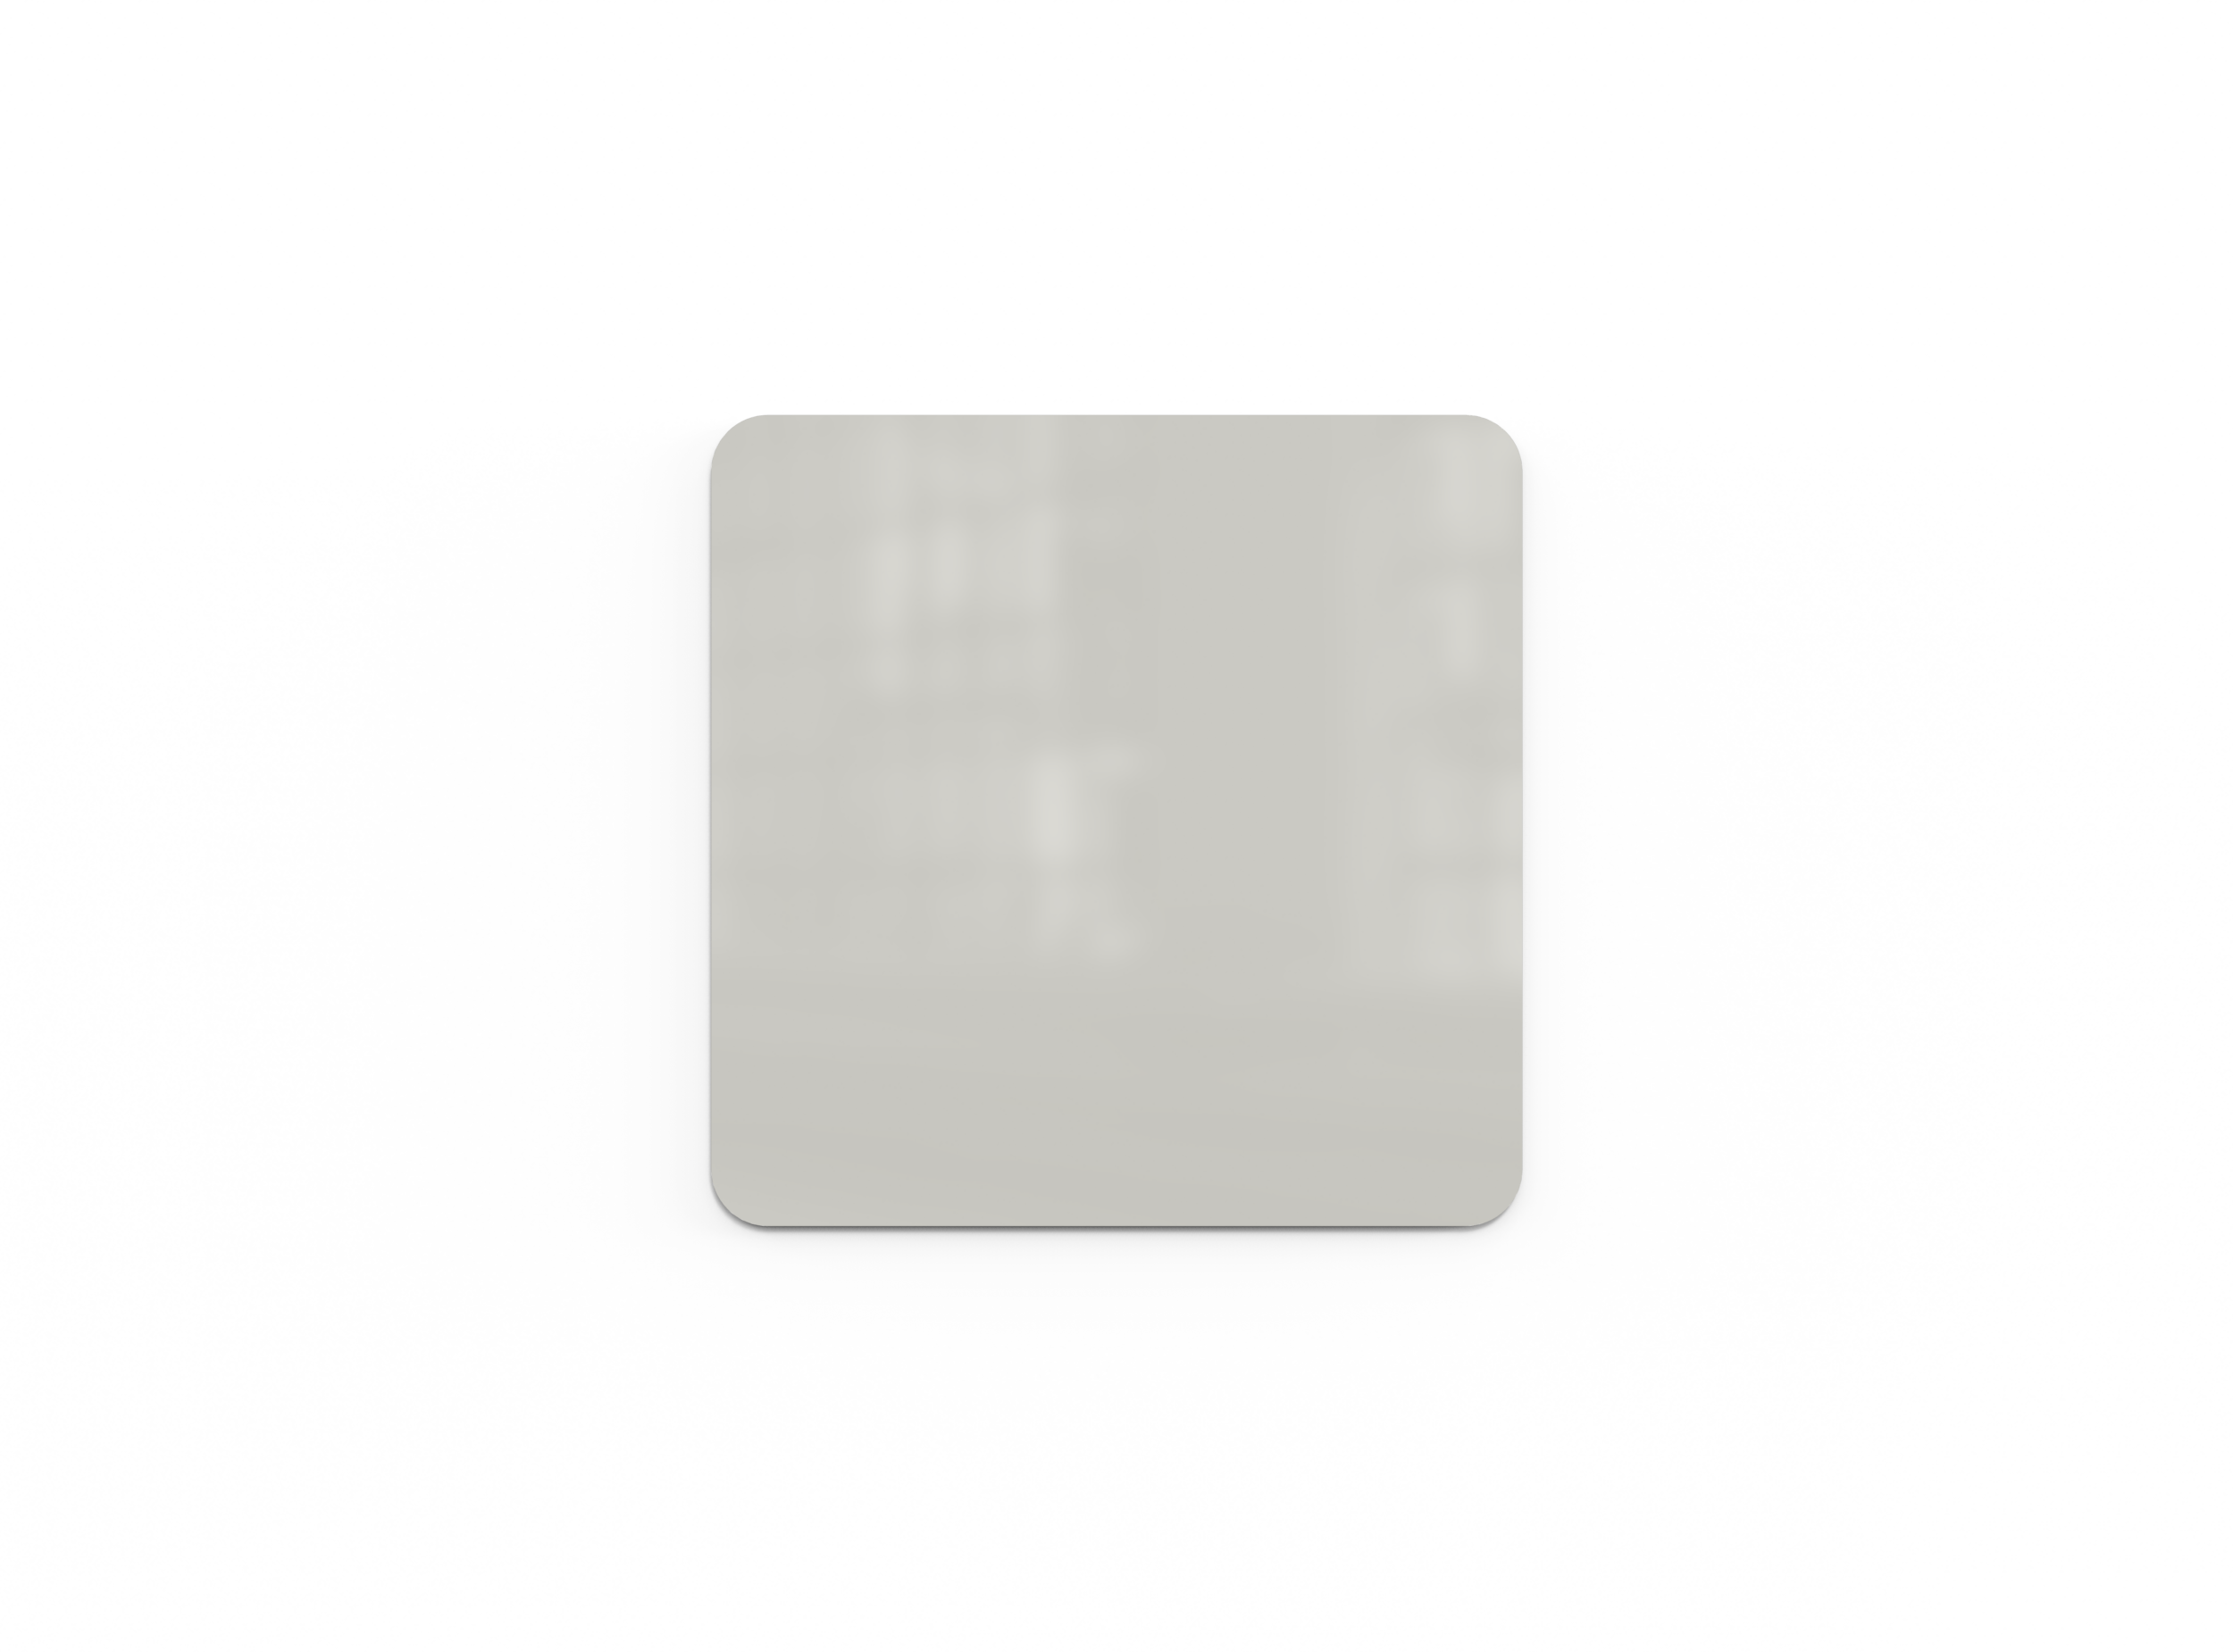 990 x 990